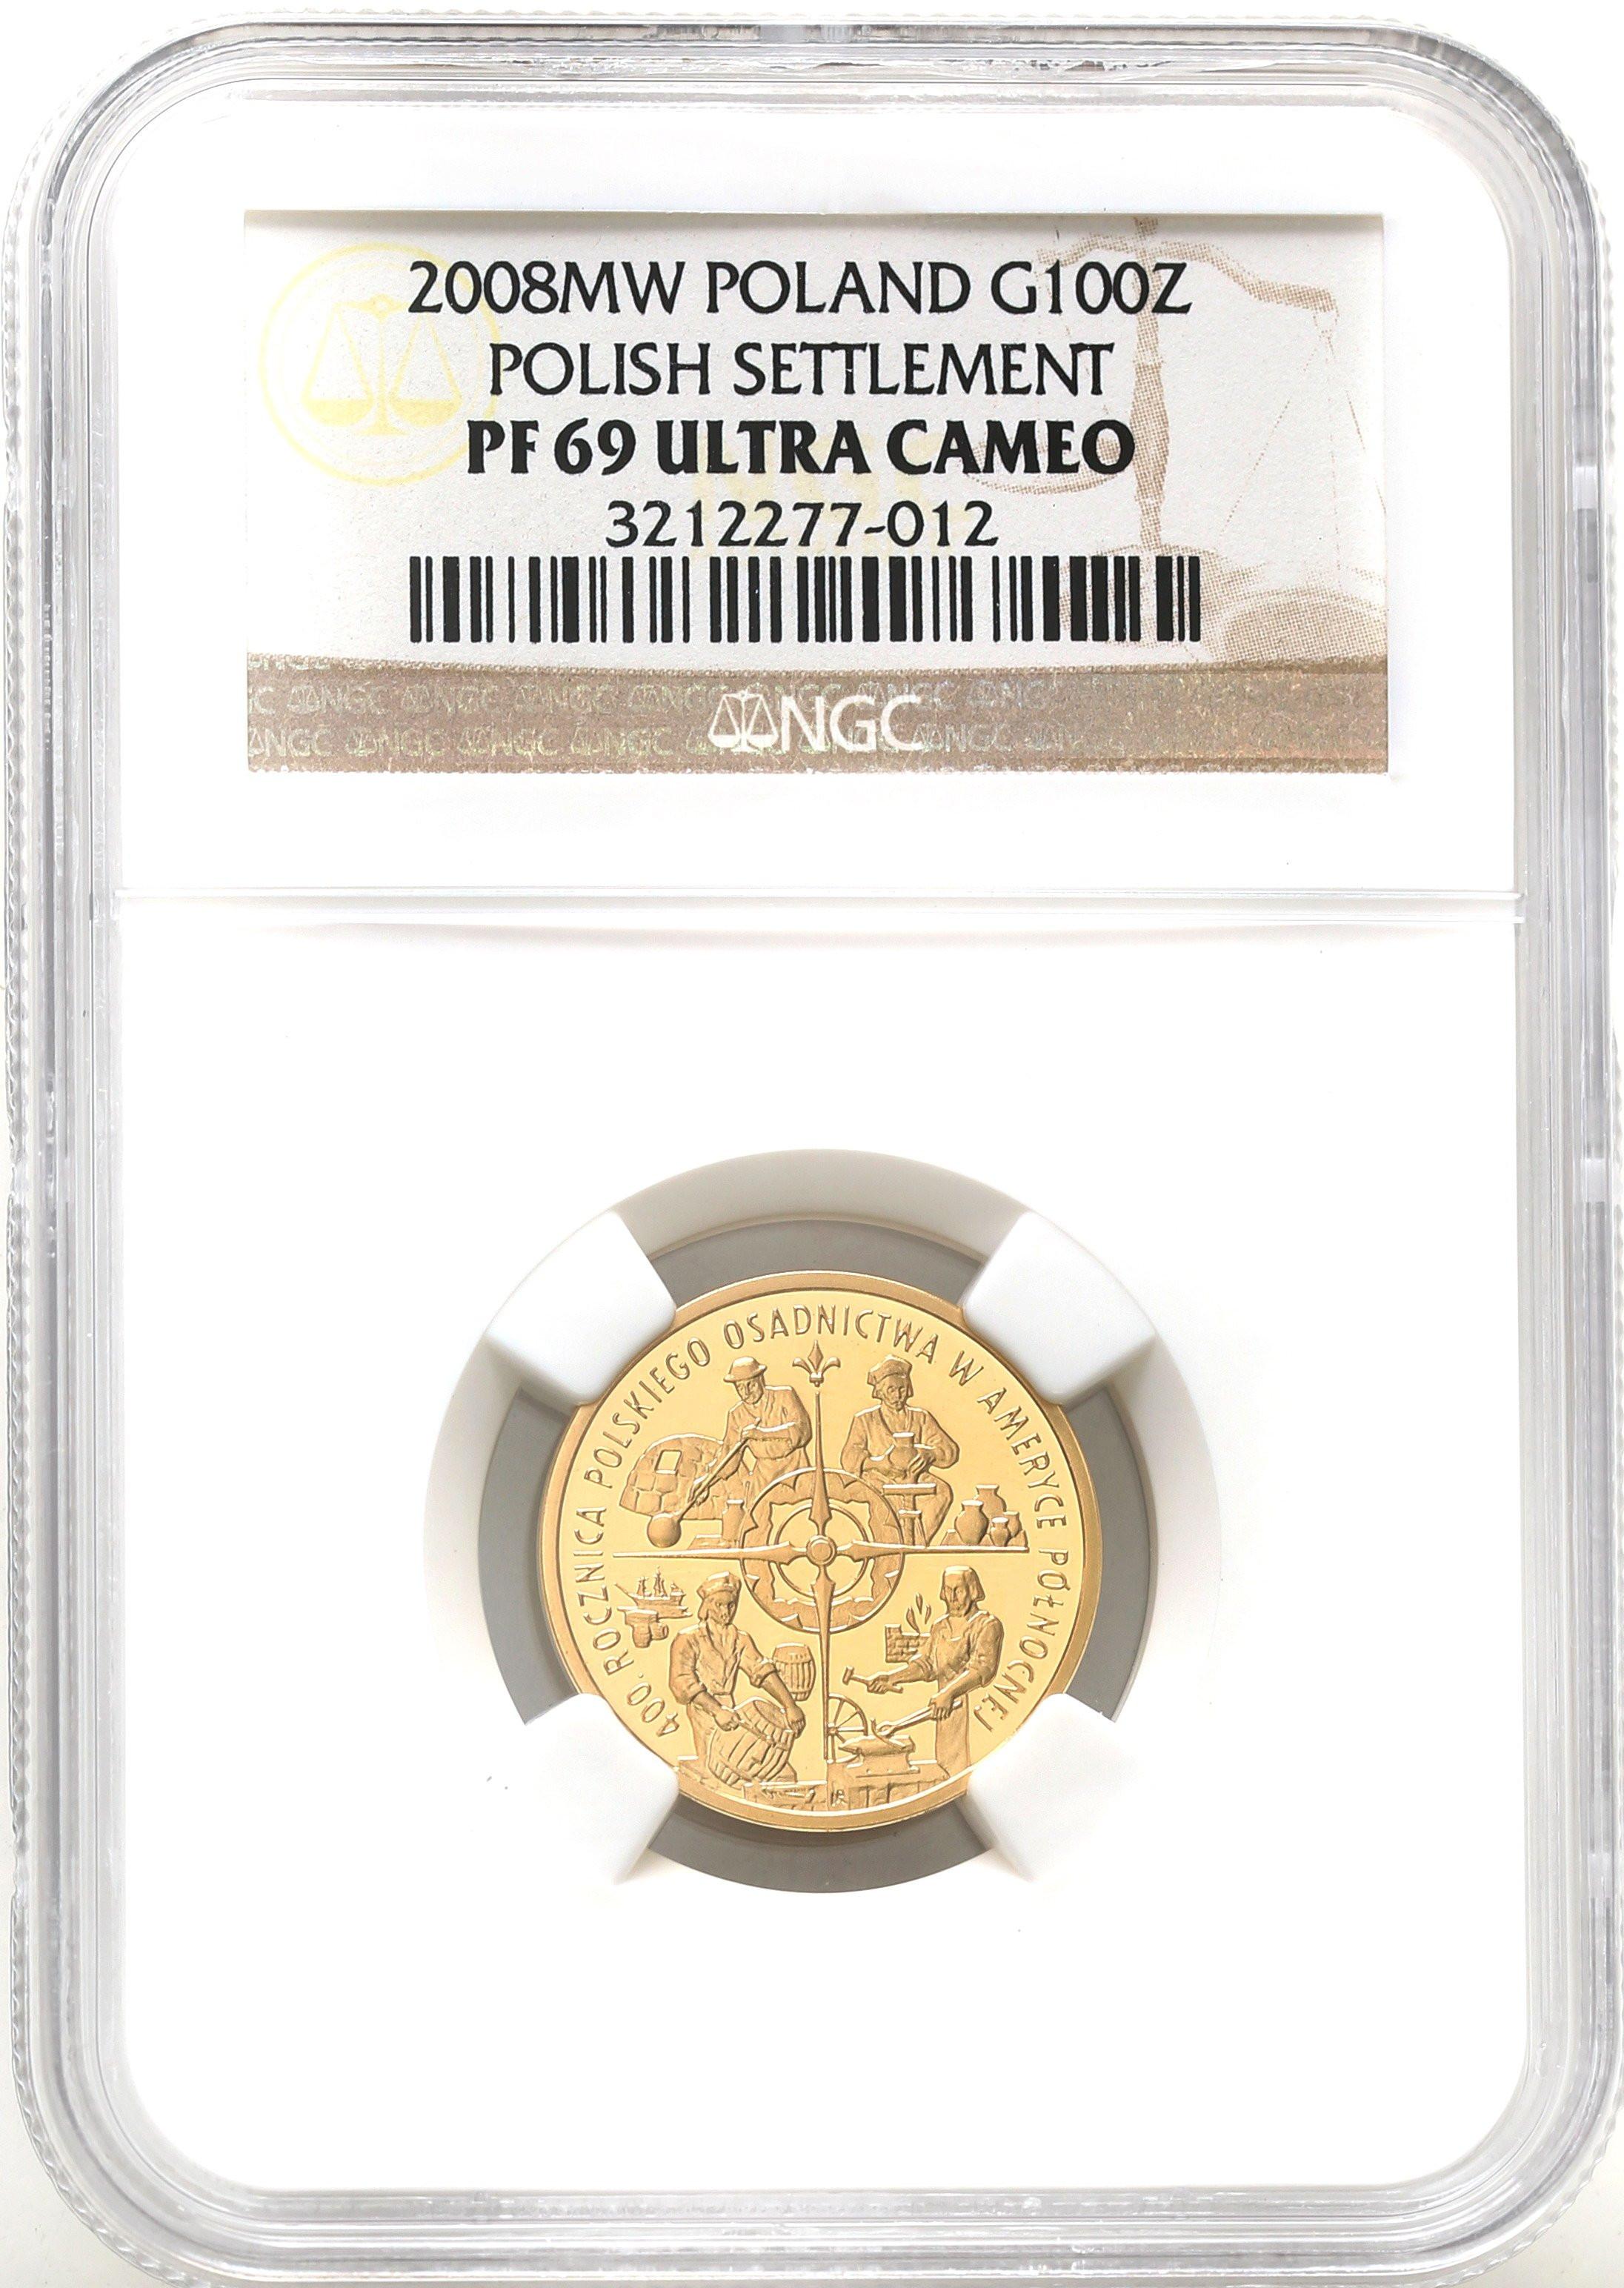 III RP. 100 złotych 2008 Osadnictwo w Ameryce NGC PF69 ULTRA CAMEO (2MAX)